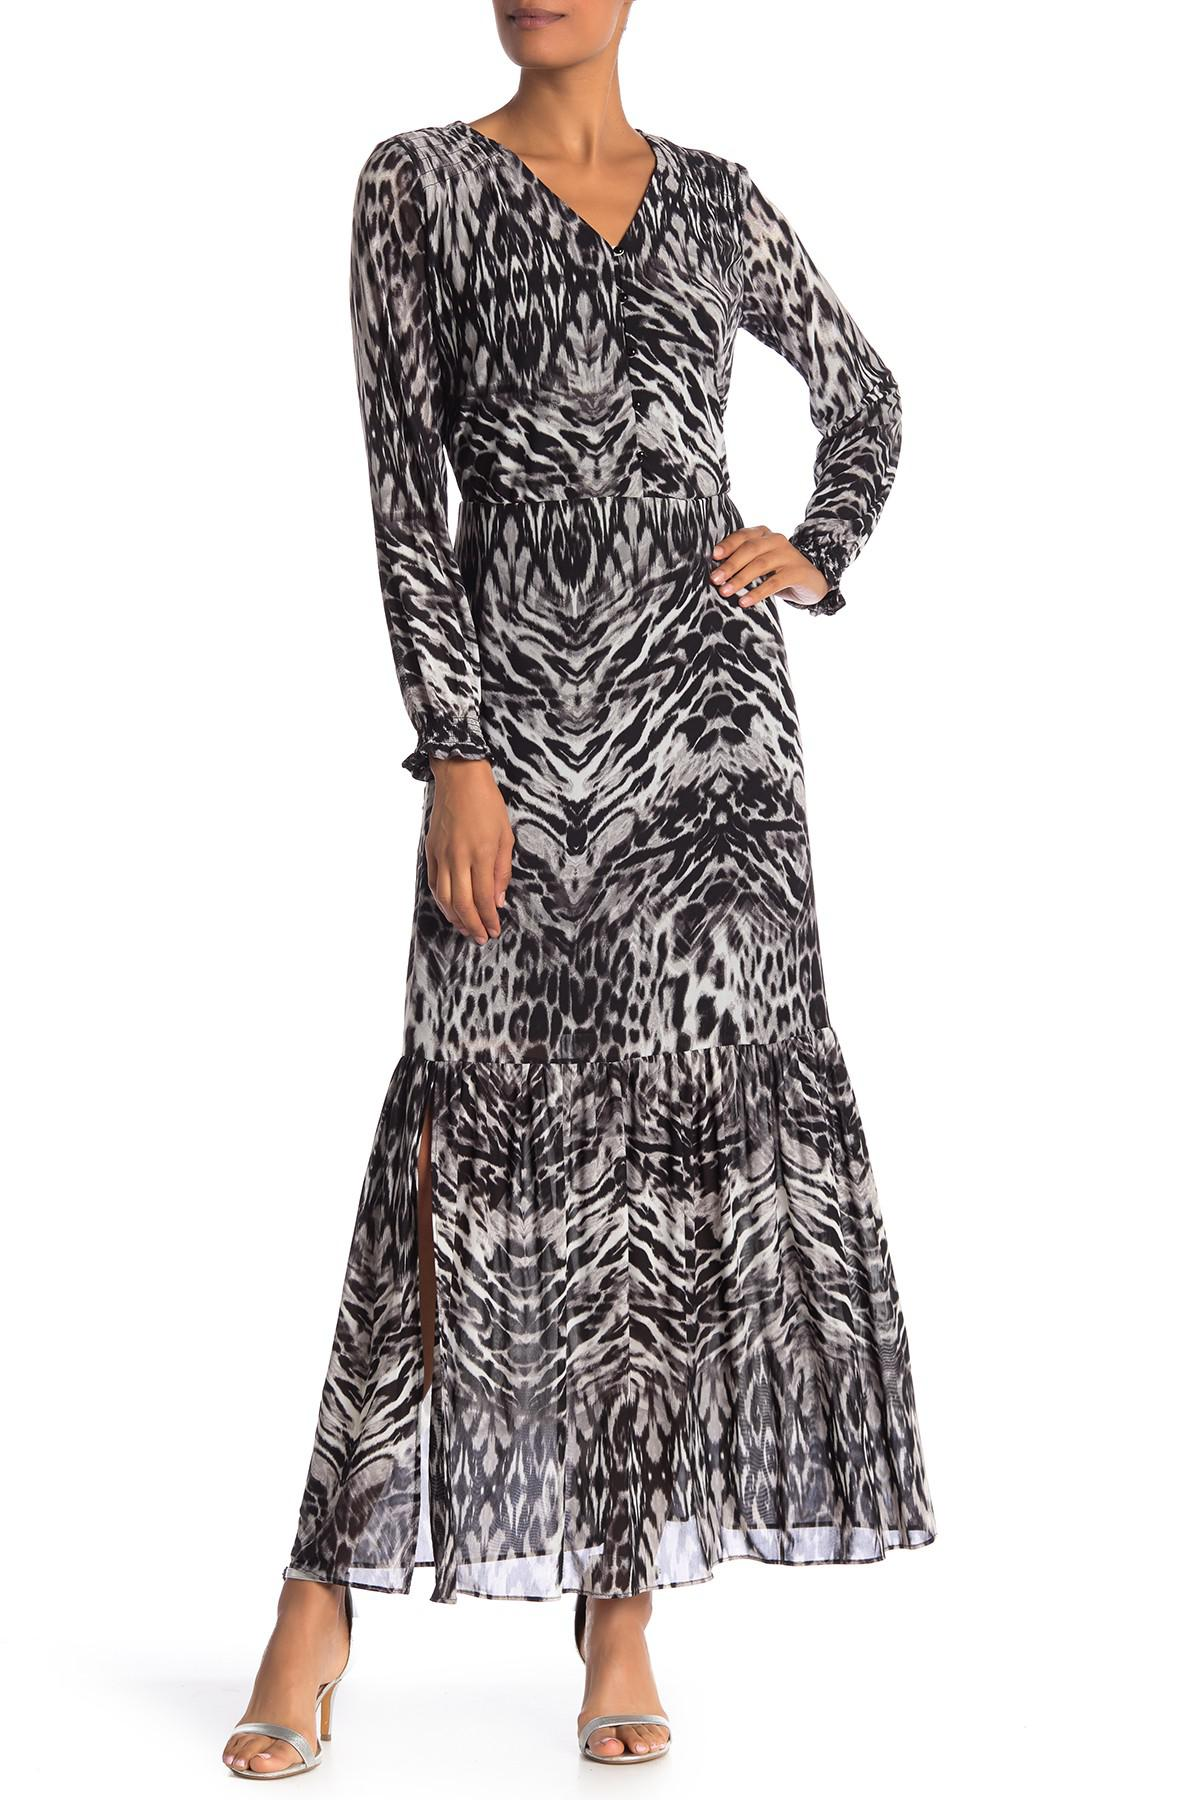 607c8cc3baa786 Lyst - Eci V-neck Animal Print Maxi Dress in Gray